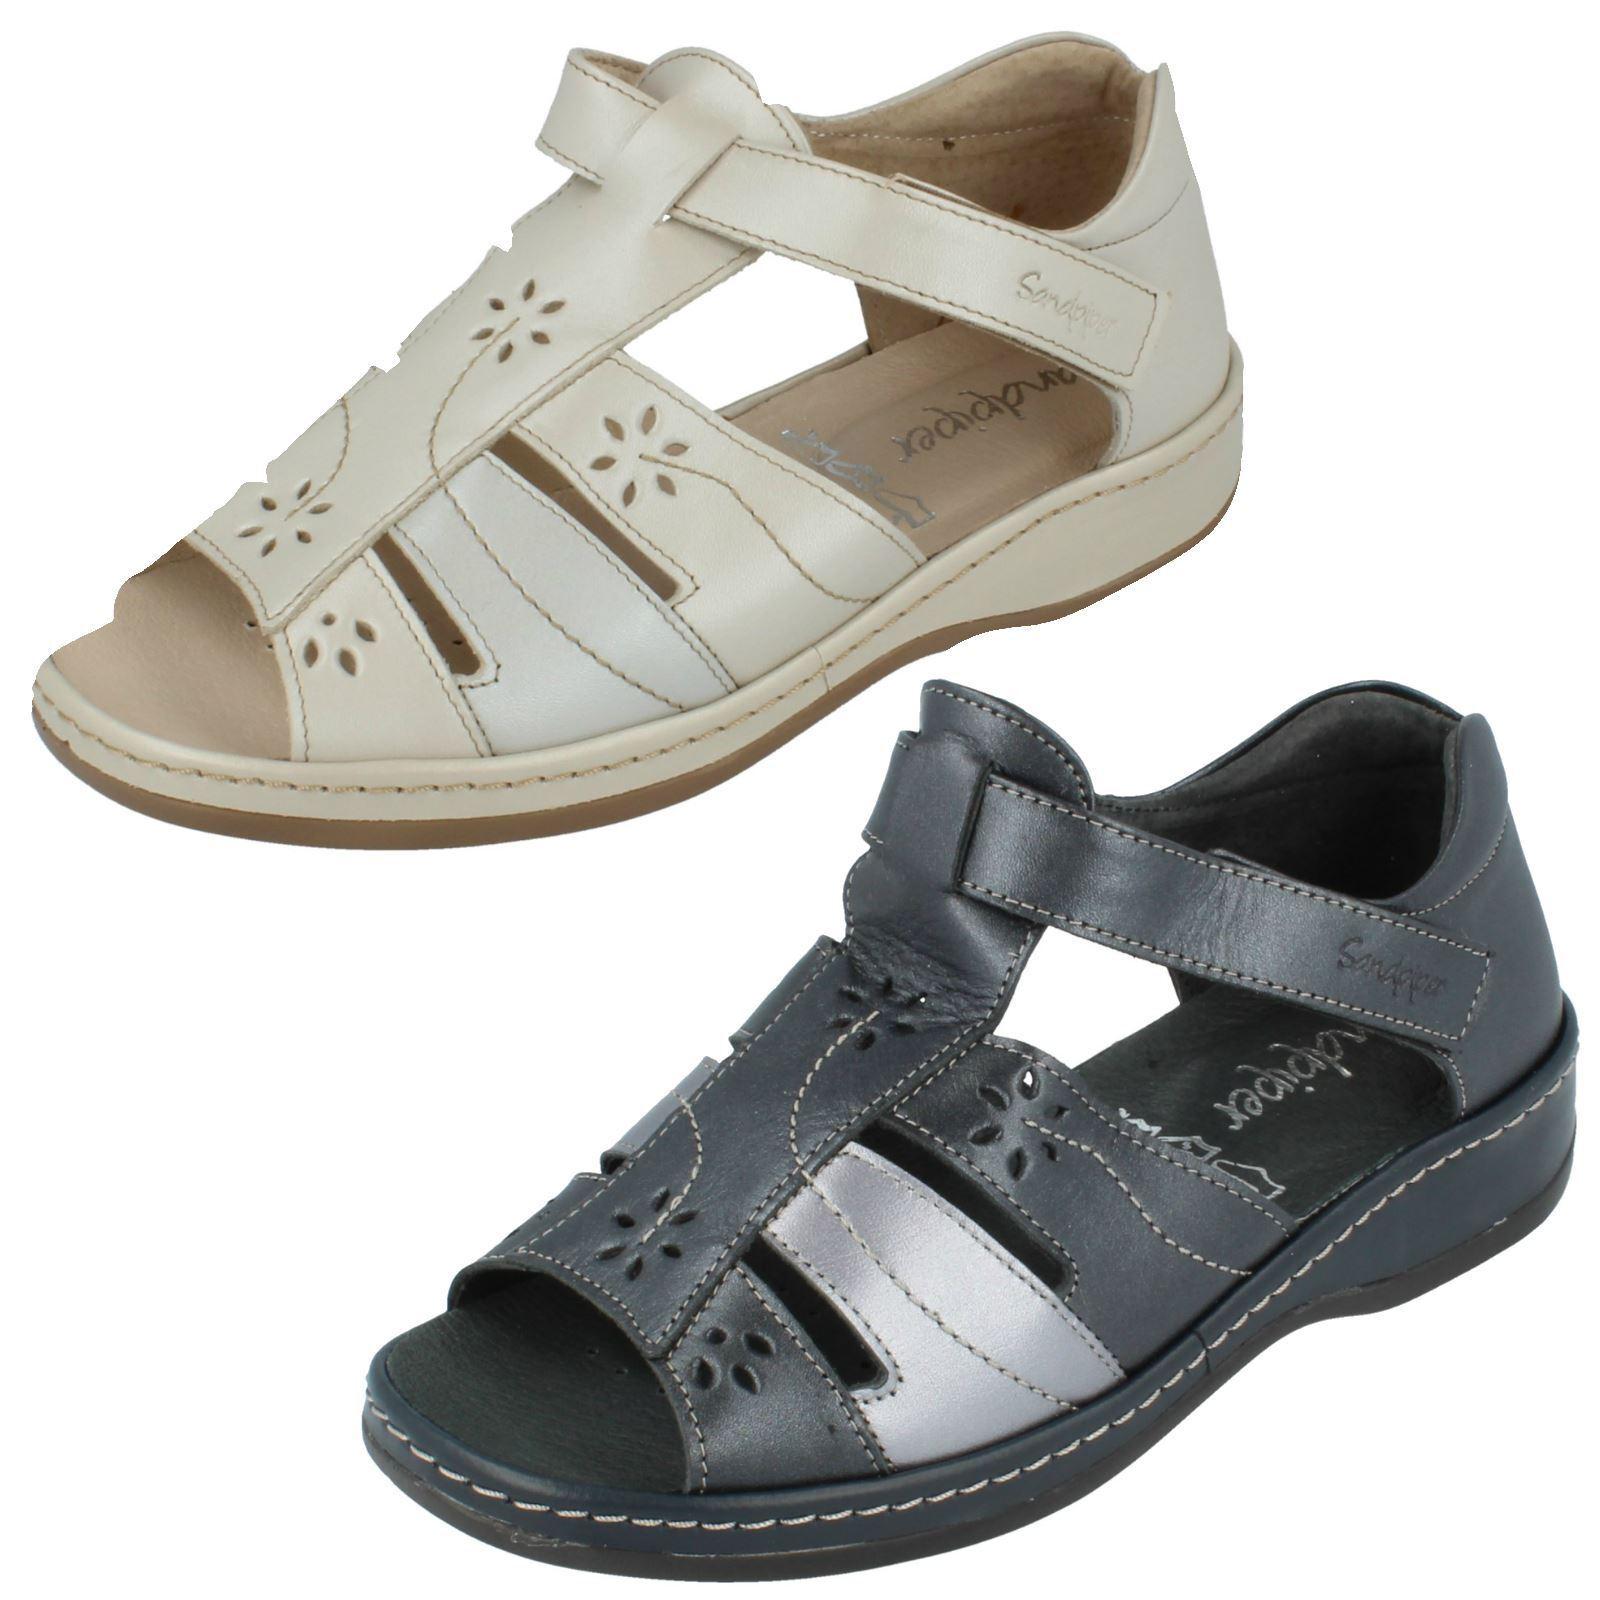 Ladies Sandpiper T-Bar Open Toe Sandals - Carly